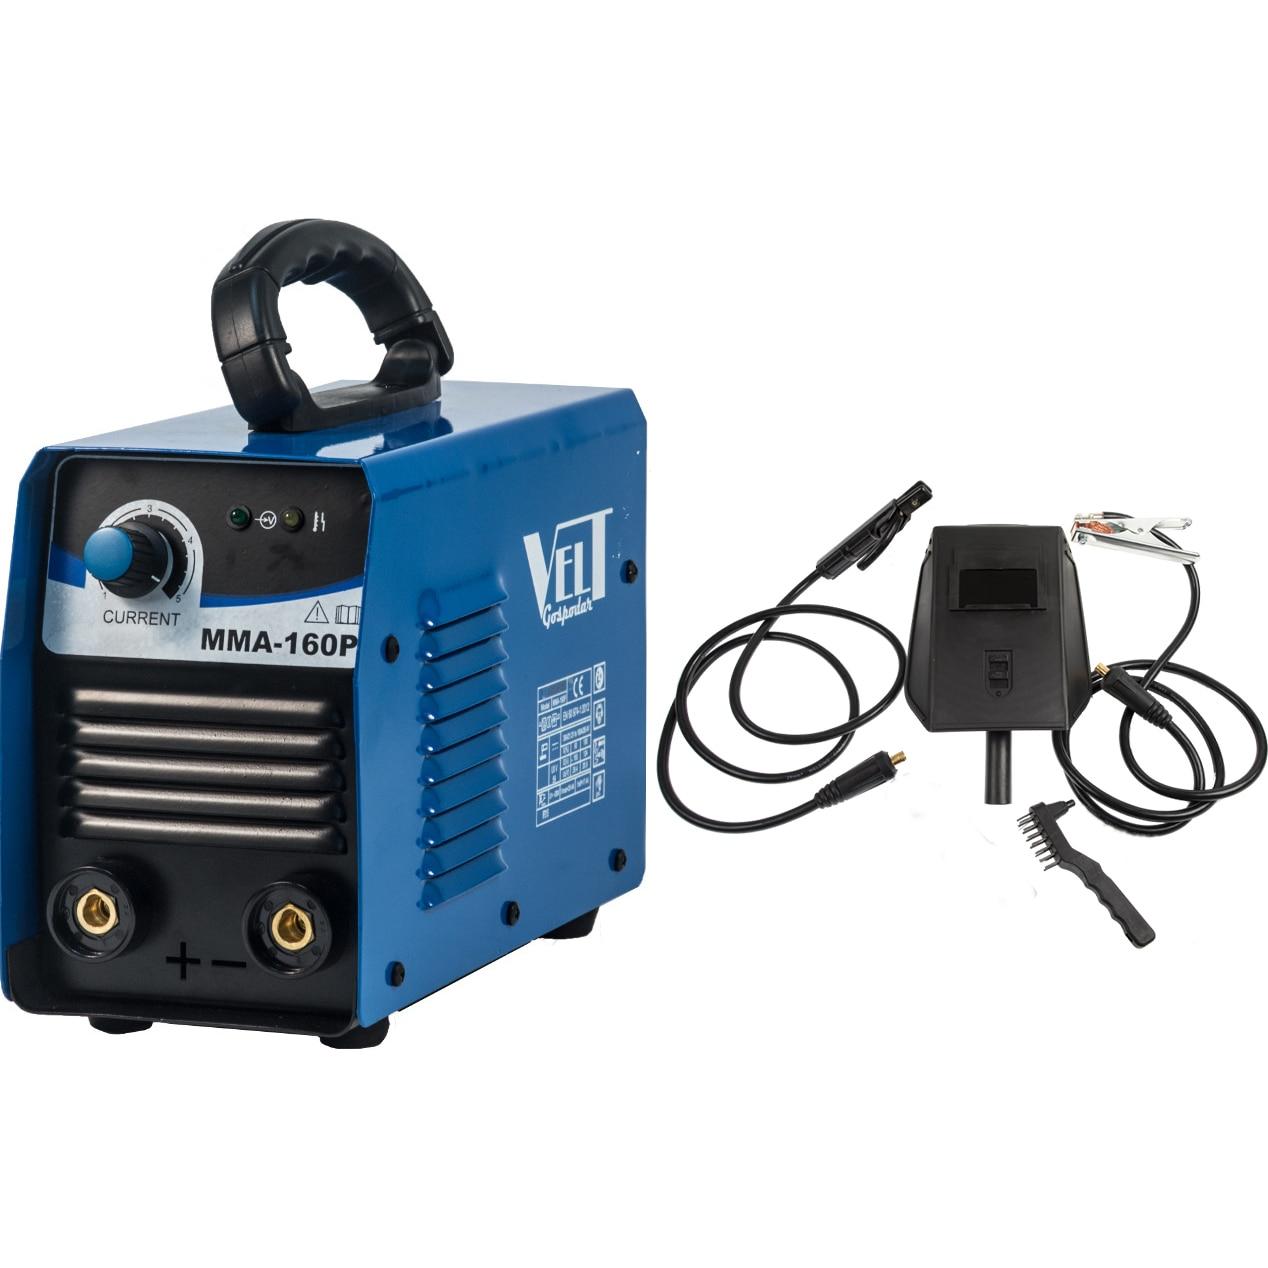 Fotografie Invertor de sudura Velt Gospodar MMA 160P, 160 A, 230 V, electrod 1.6-4 mm, 3.6 kg